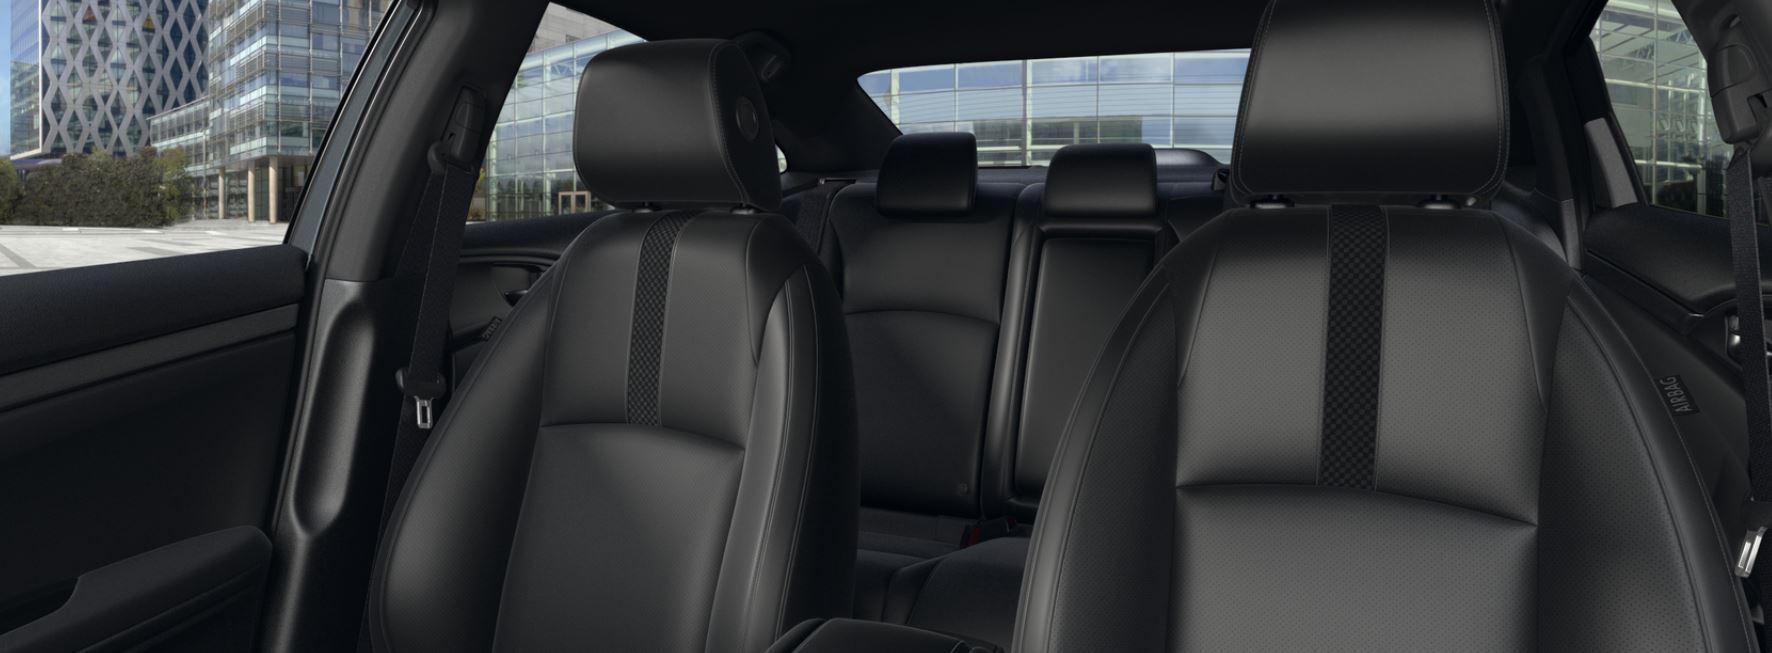 Honda Civic Executive